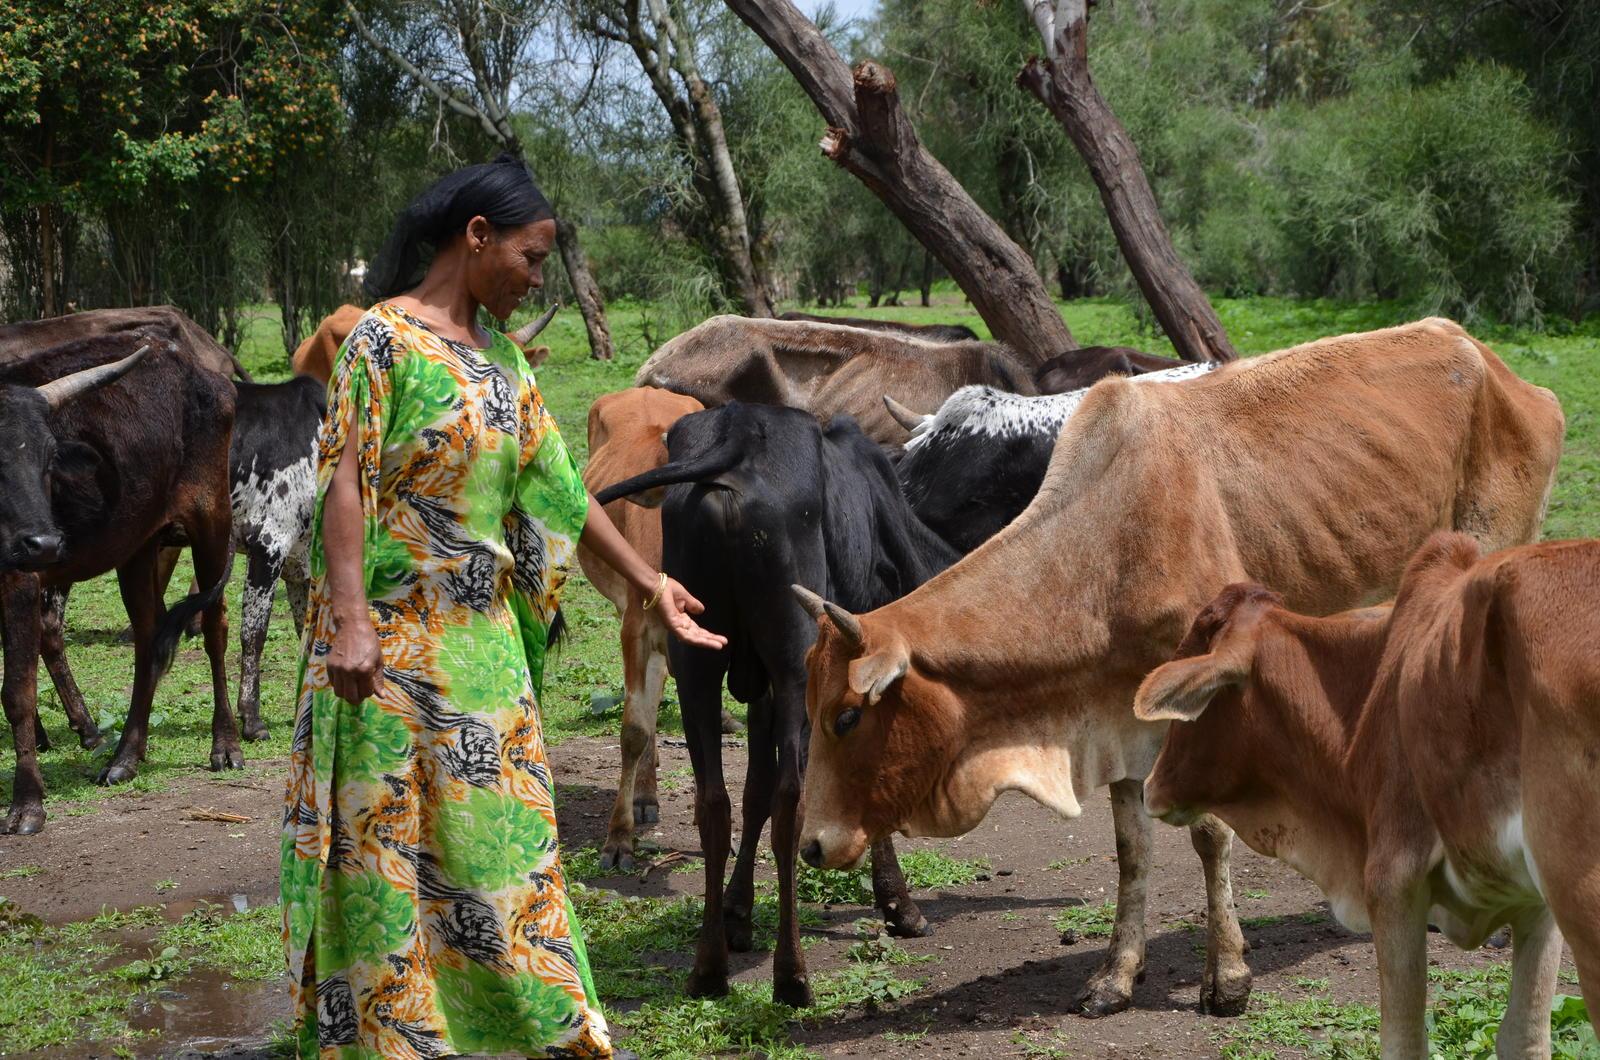 Kedija Wako takes care of the livestock the family owns (Photo Credit-UN Women-Fikerte Abebe)